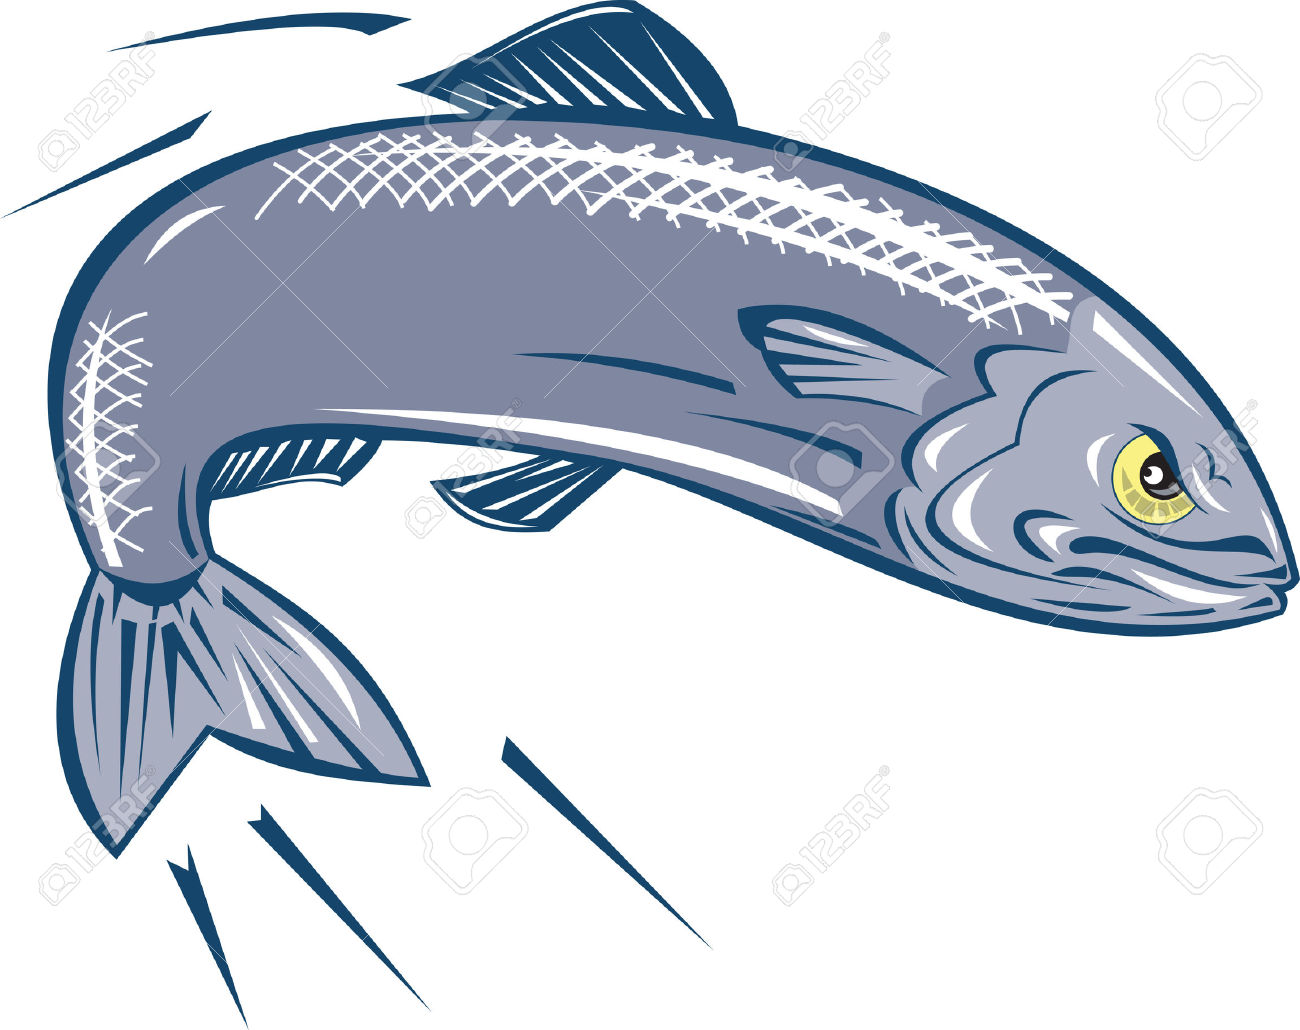 Sardine clipart #10, Download drawings